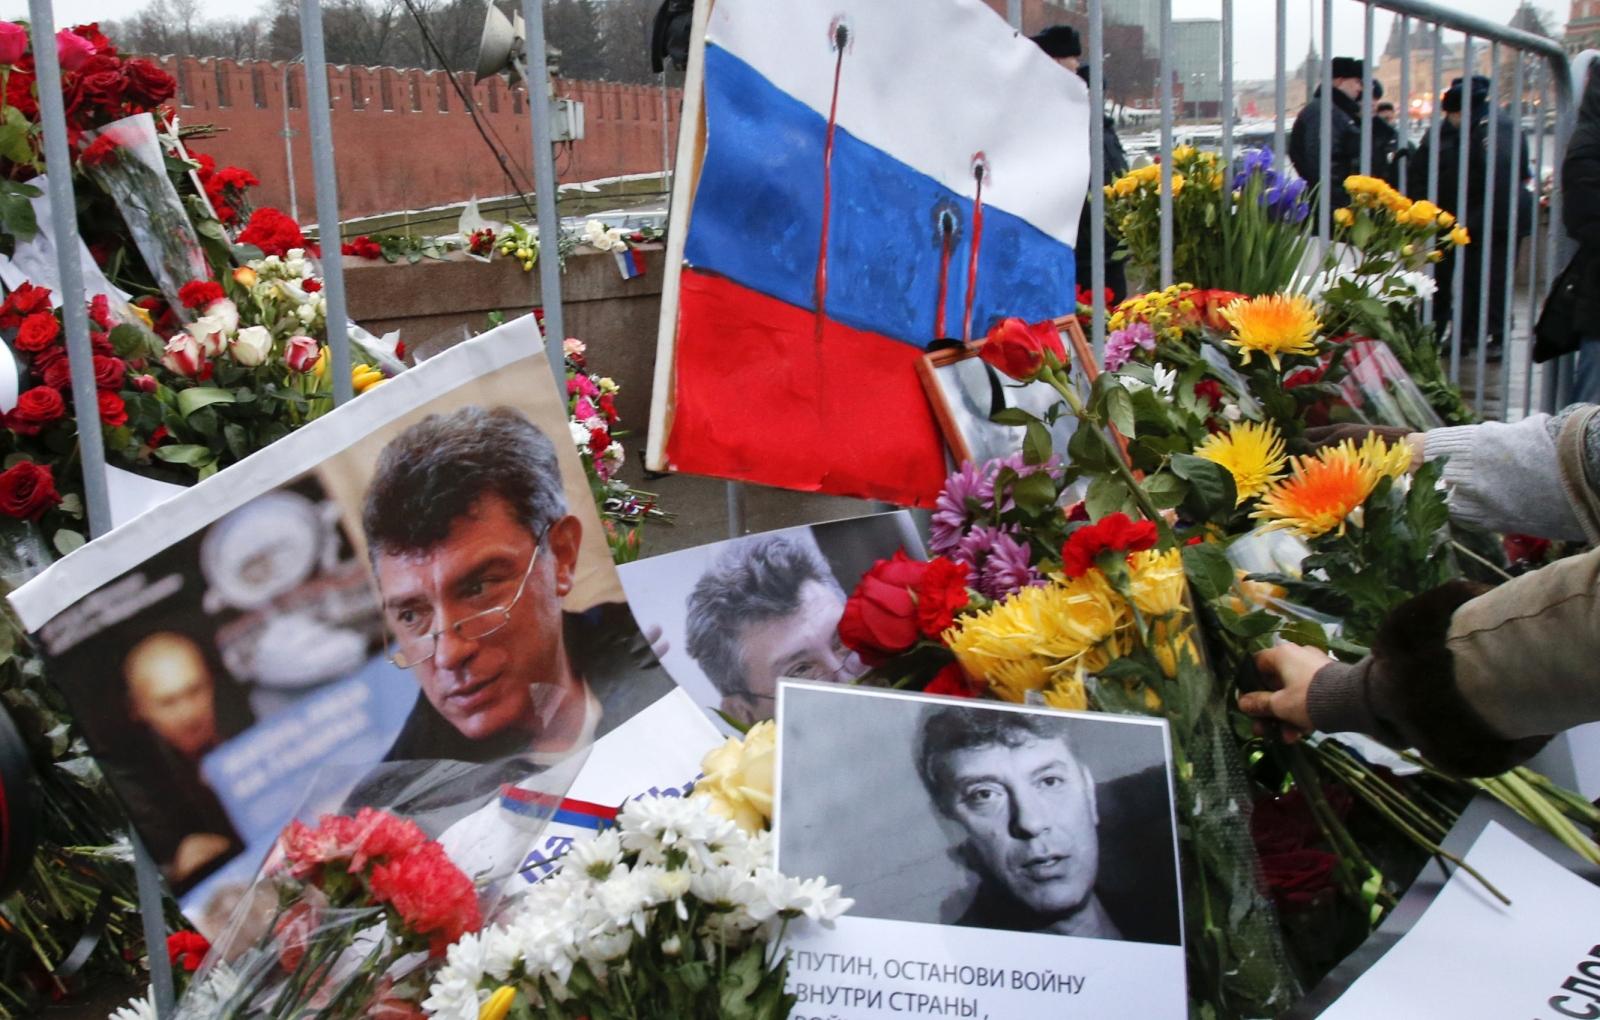 Tribute to Boris Nemtsov